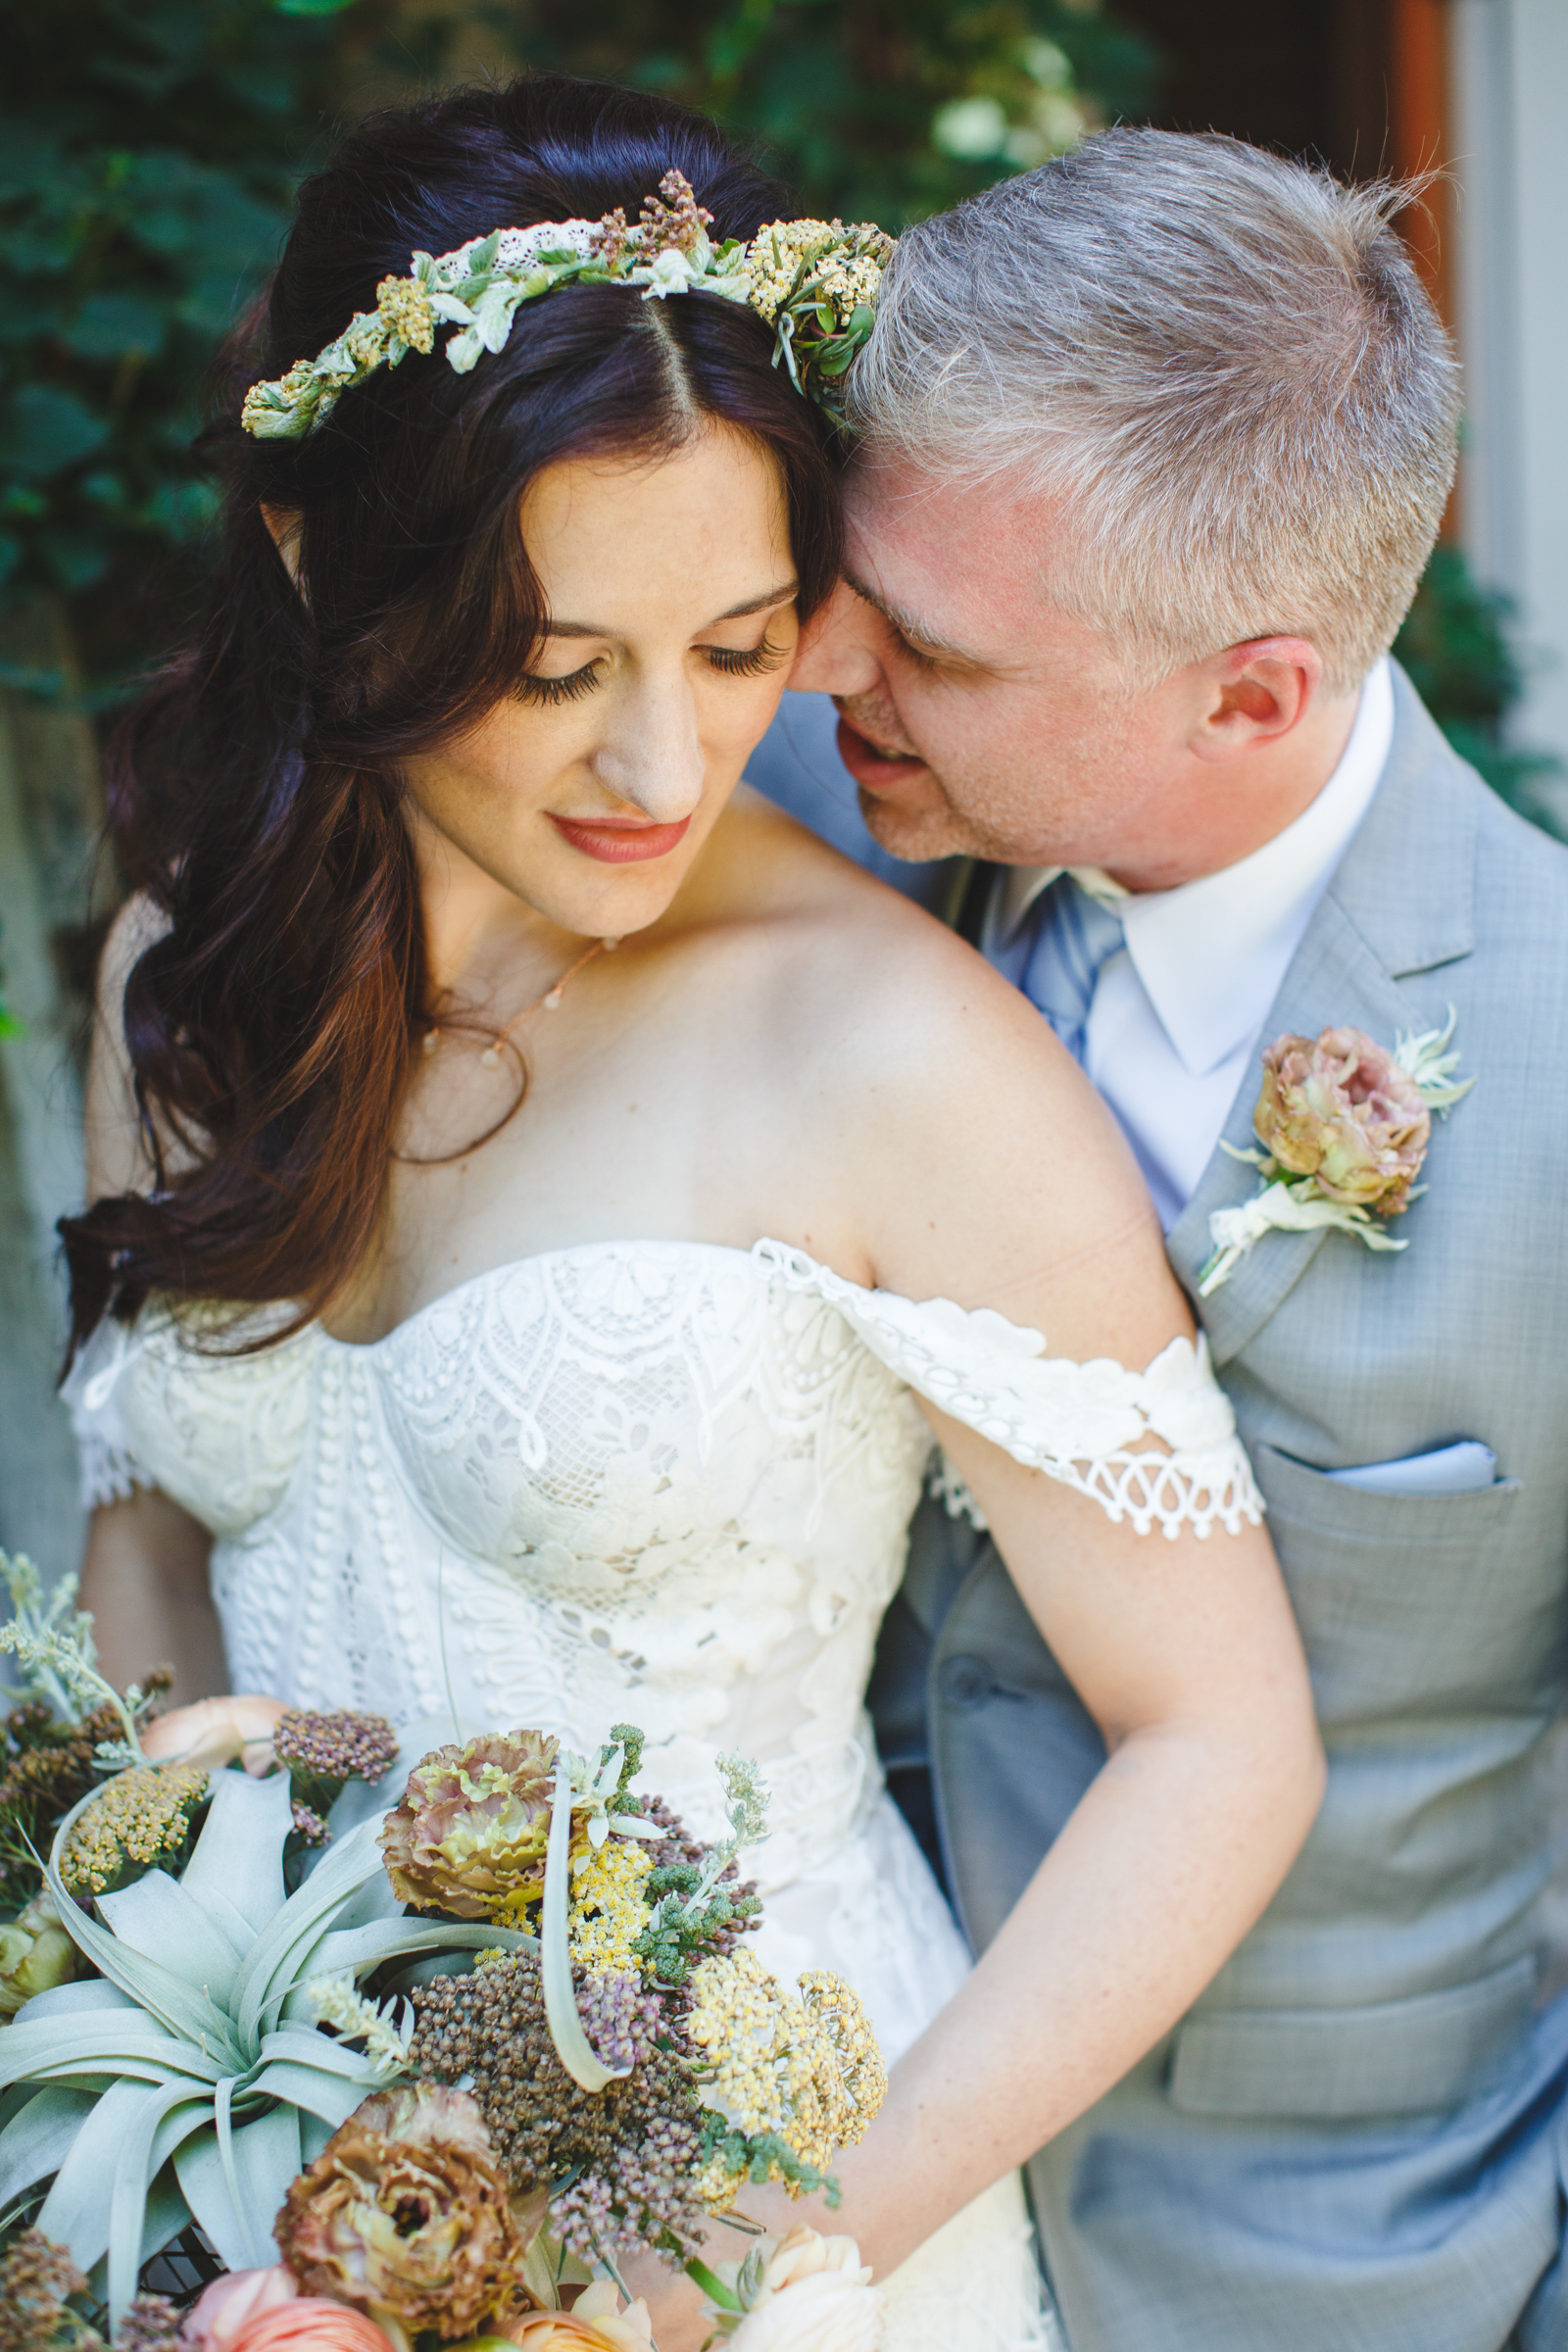 Intimate couple portrait - photo by Satya Curcio Photography